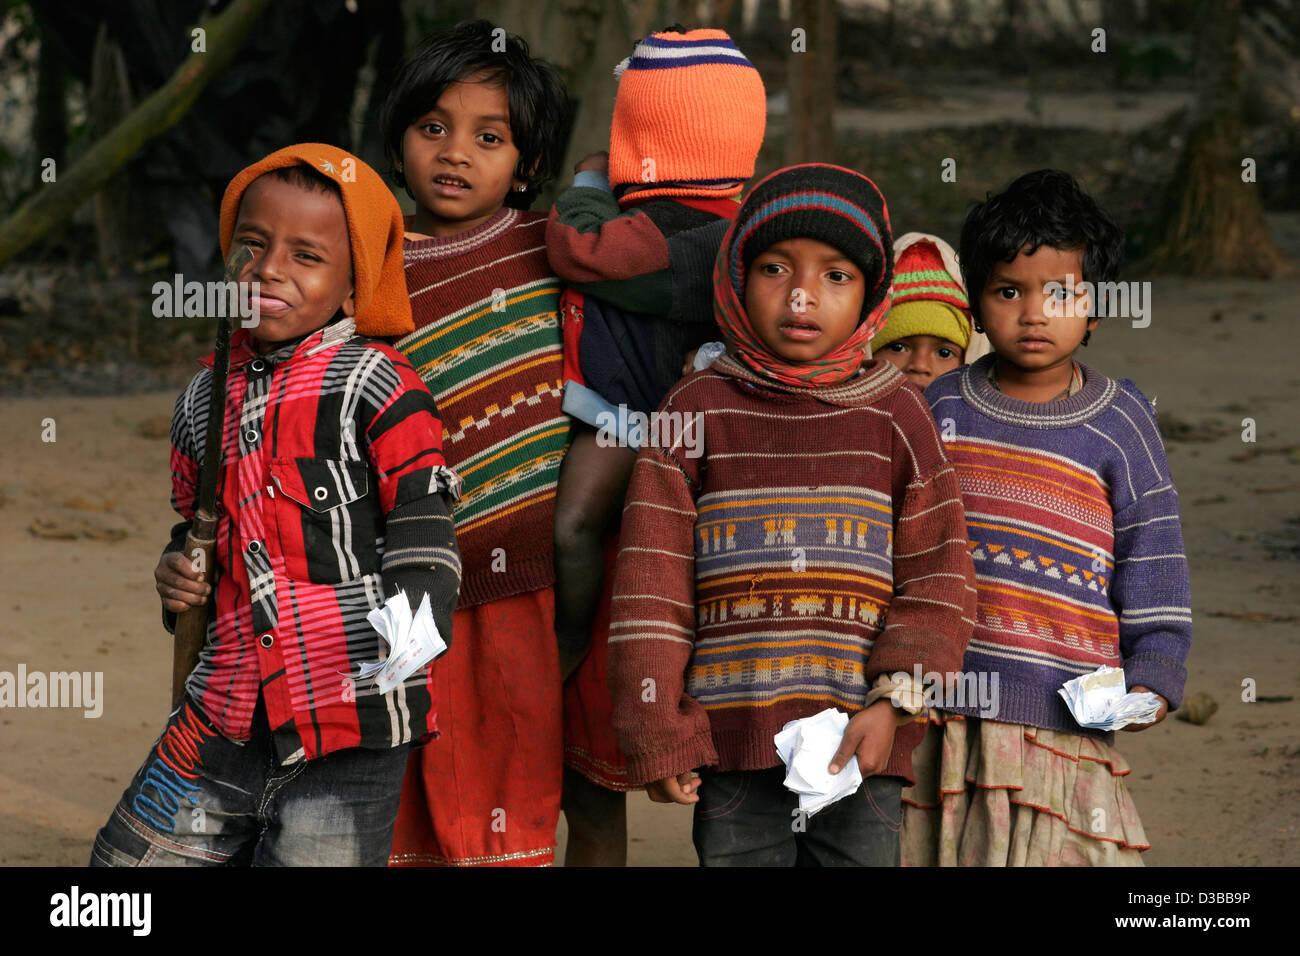 Bangladeshi children, Bangladesh - Stock Image